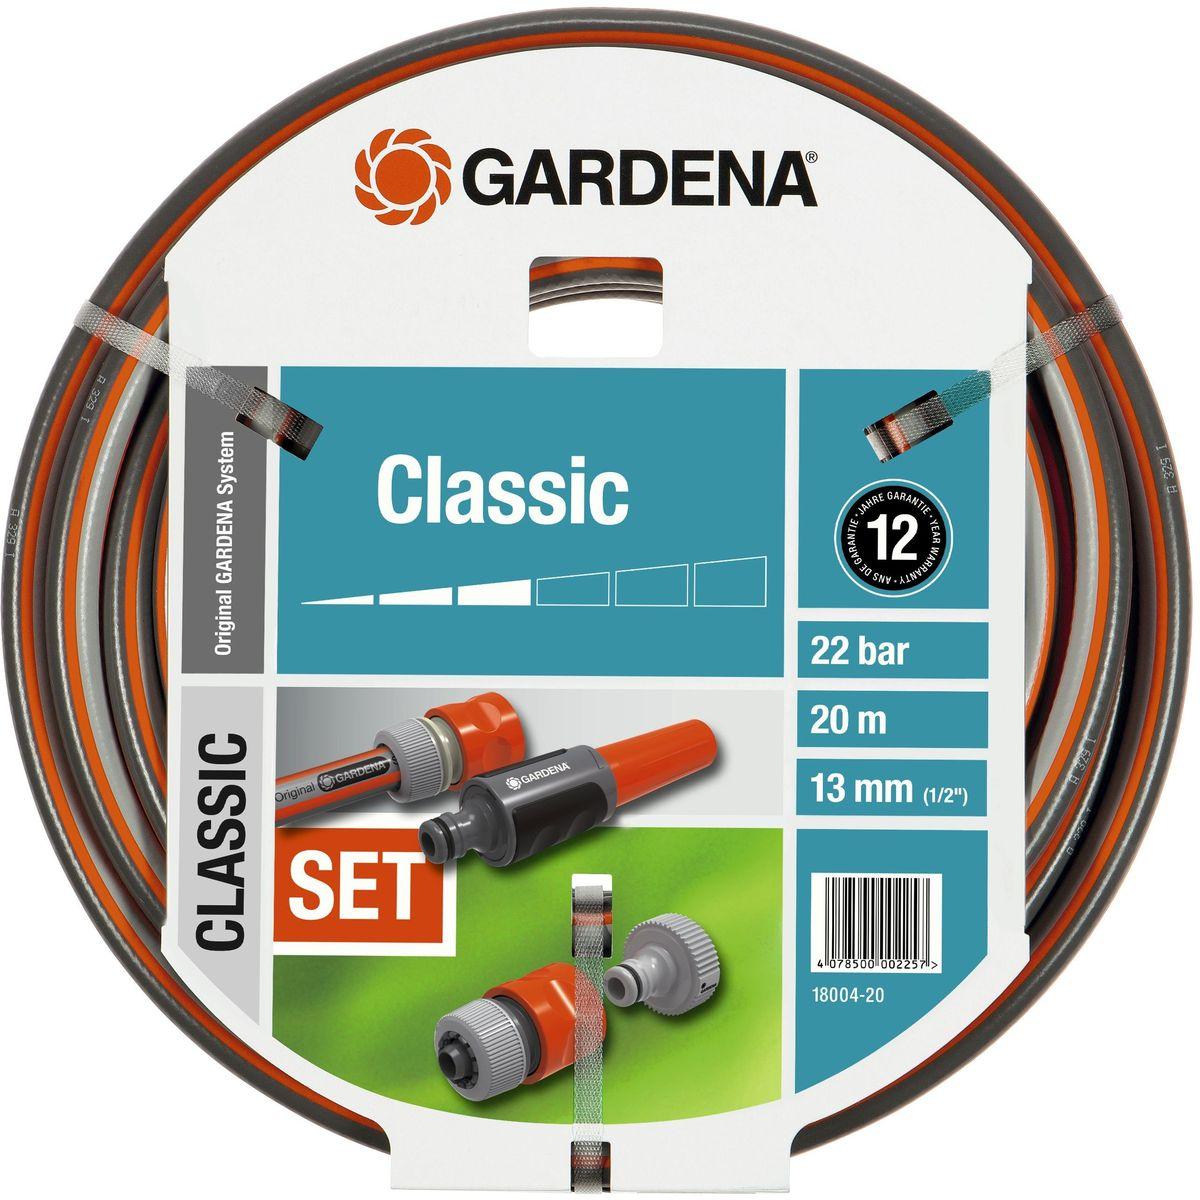 Шланг Gardena Classic, с аксессуарами, диаметр 1/2, длина 20 м катушка со шлангом и фитингом gardena 50 classic 02691 20